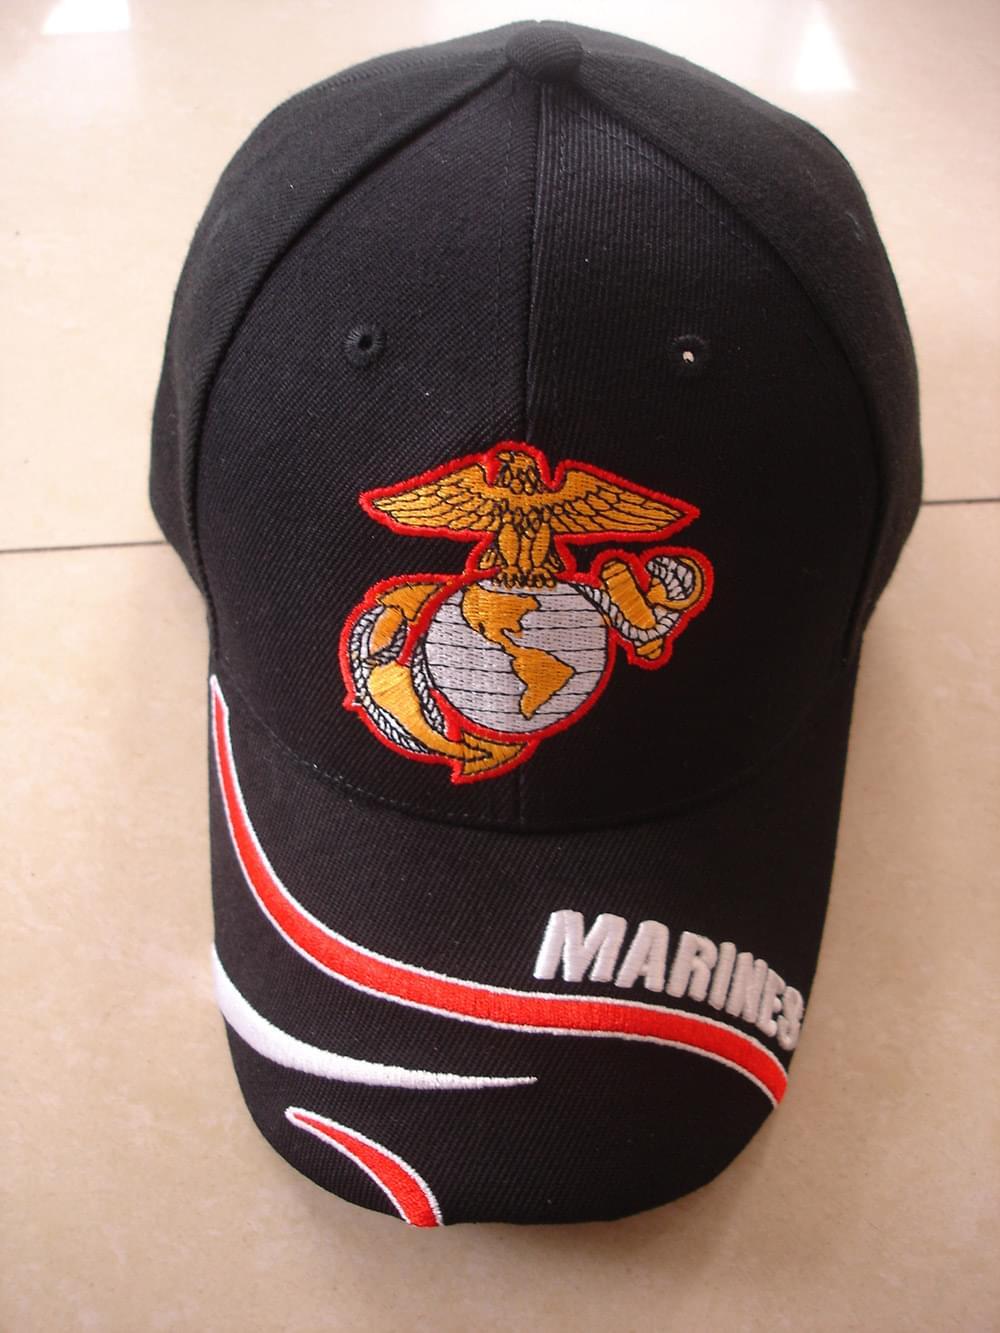 U S Marine Insignia Emb Hat Black Made In Taiwan